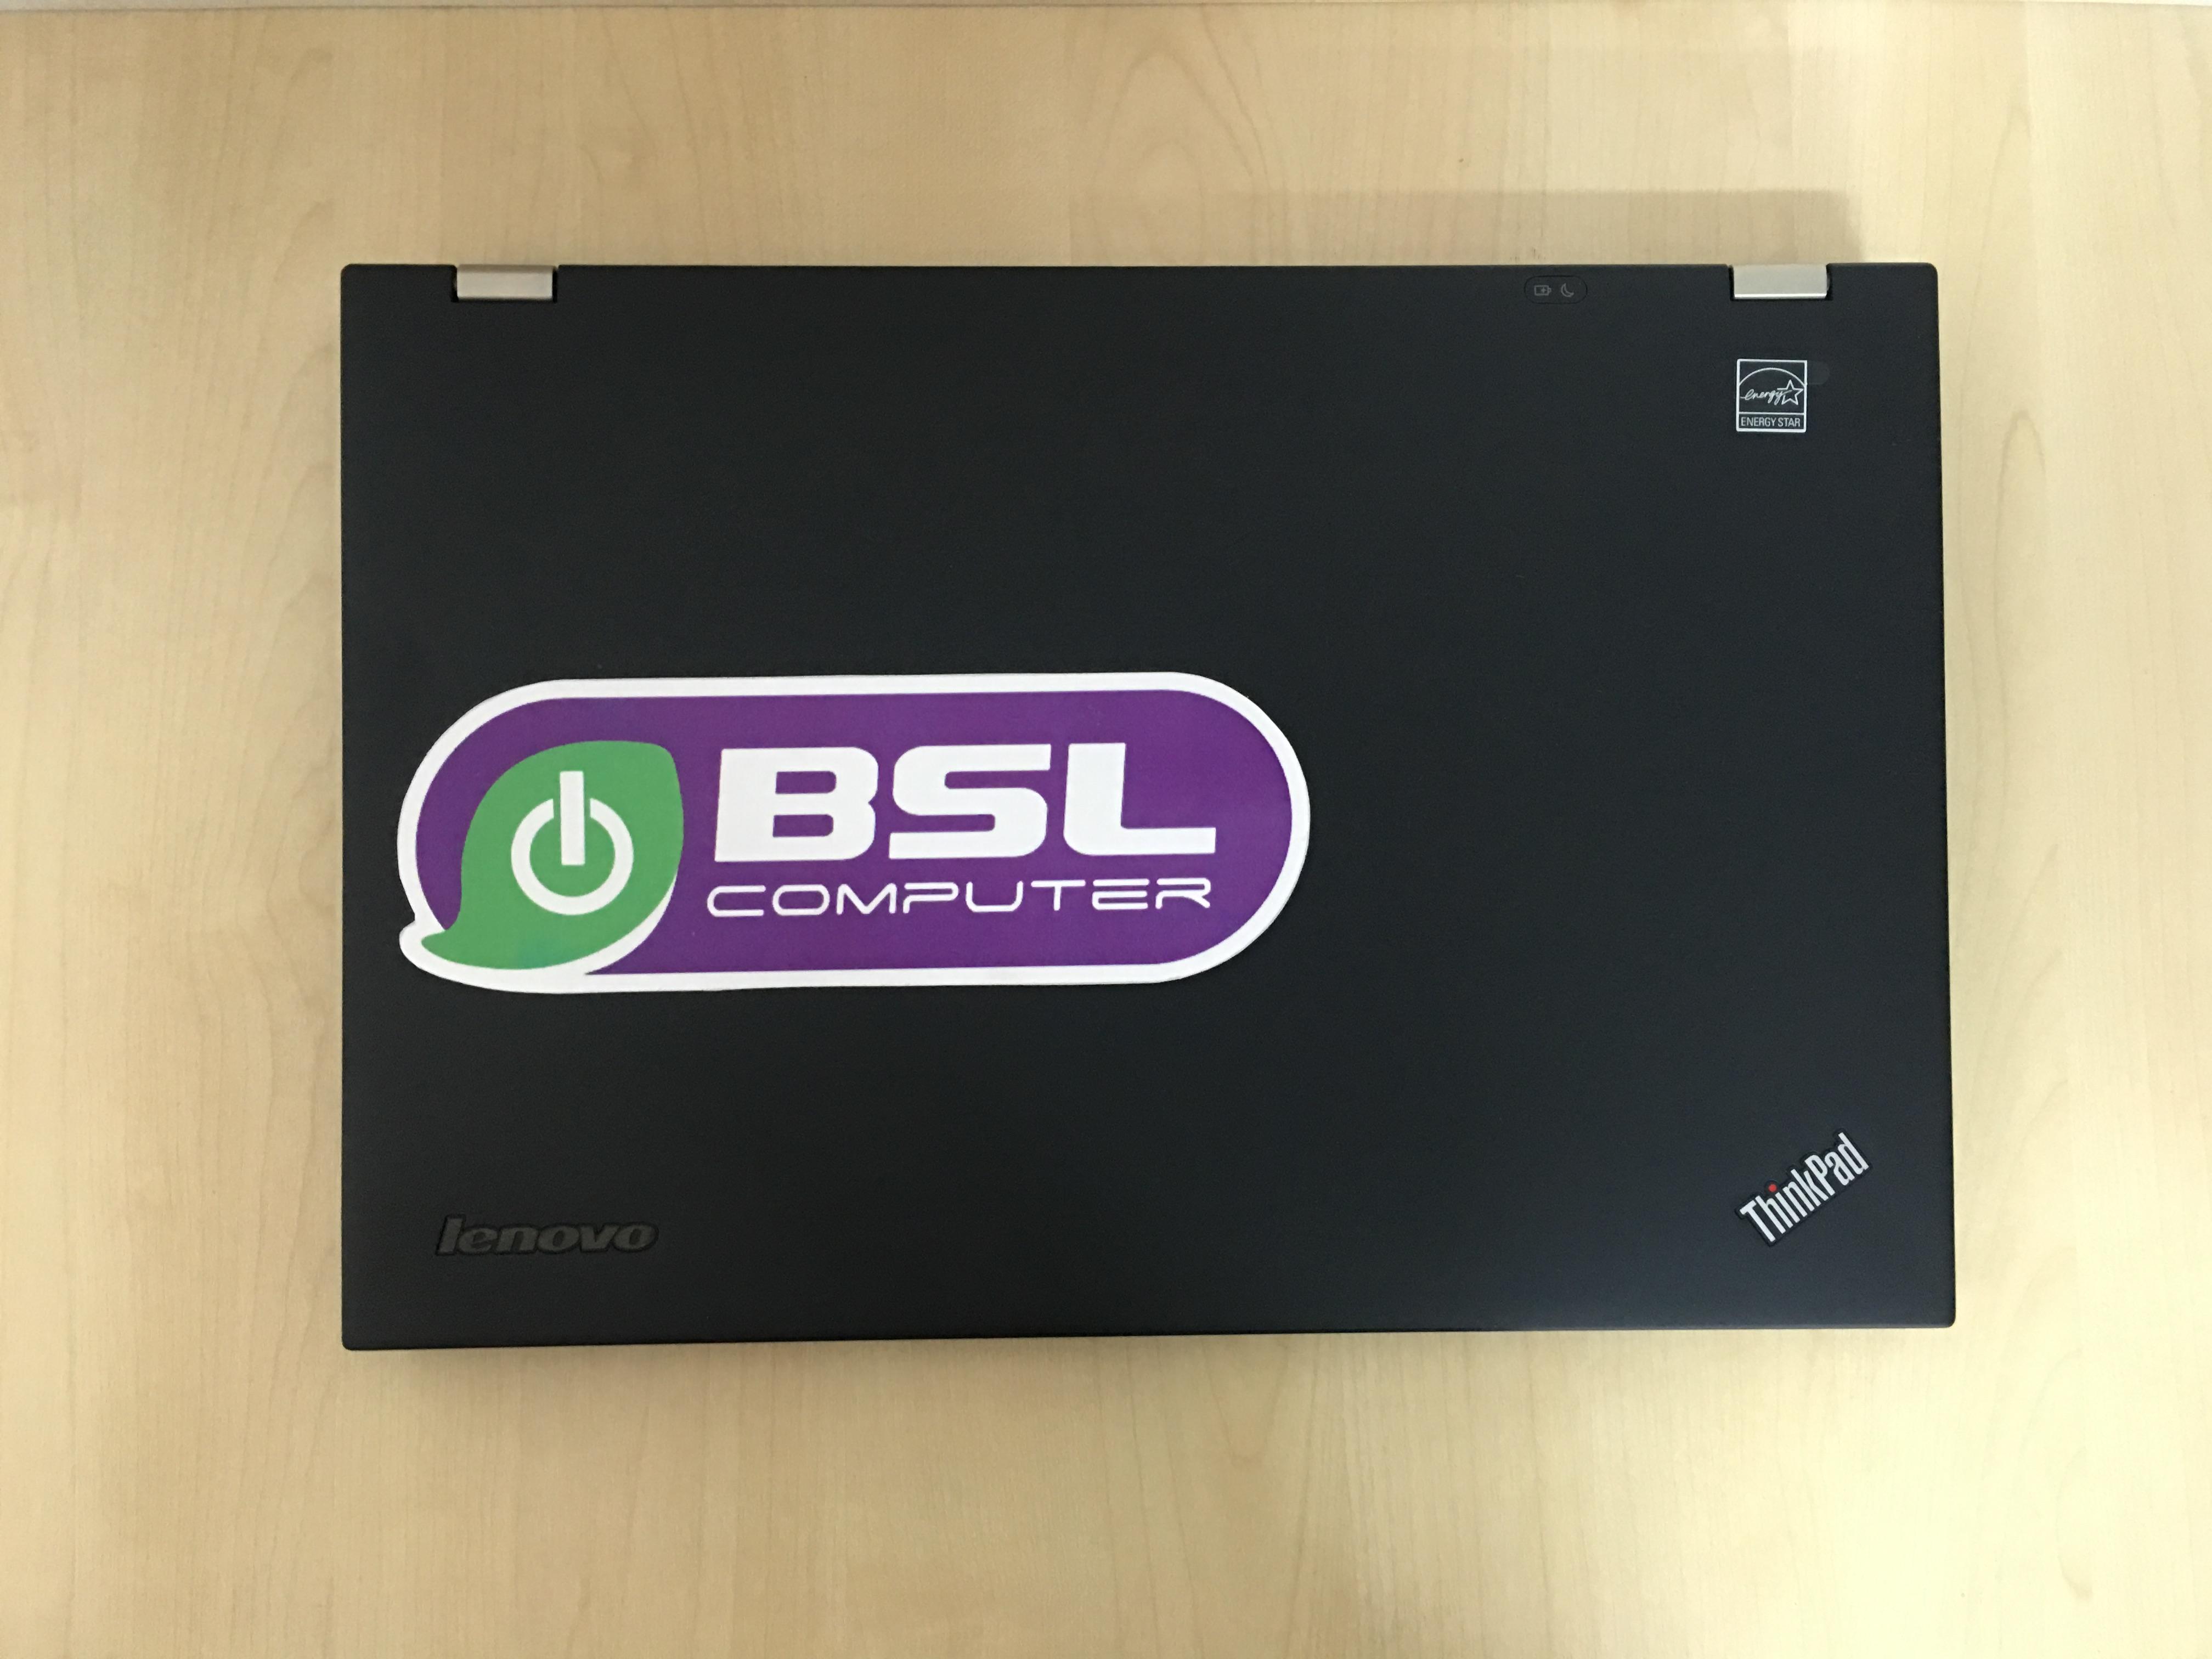 Notebook Lenovo ThinkPad T430 Intel Core i5 สวยกริ๊บ